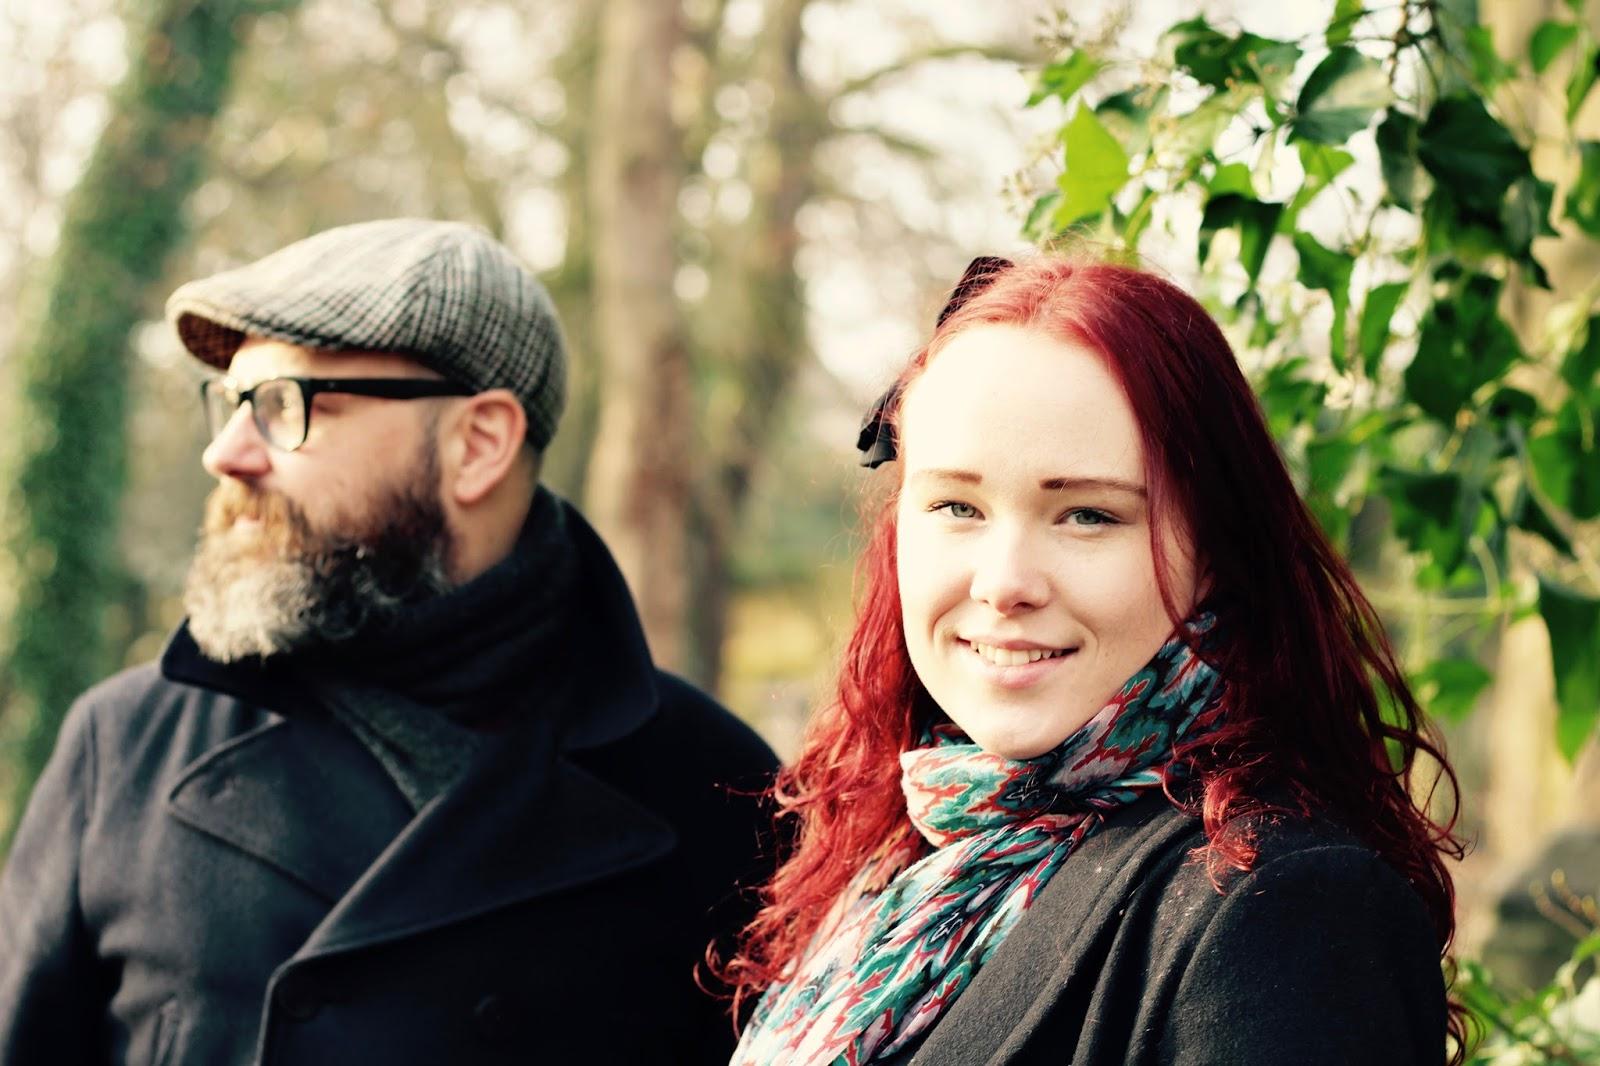 Jeff Hewer and Rebecca Frodsham, Rush Hour Jazz, Seven Arts, Wed 19 Dec 6-7pm